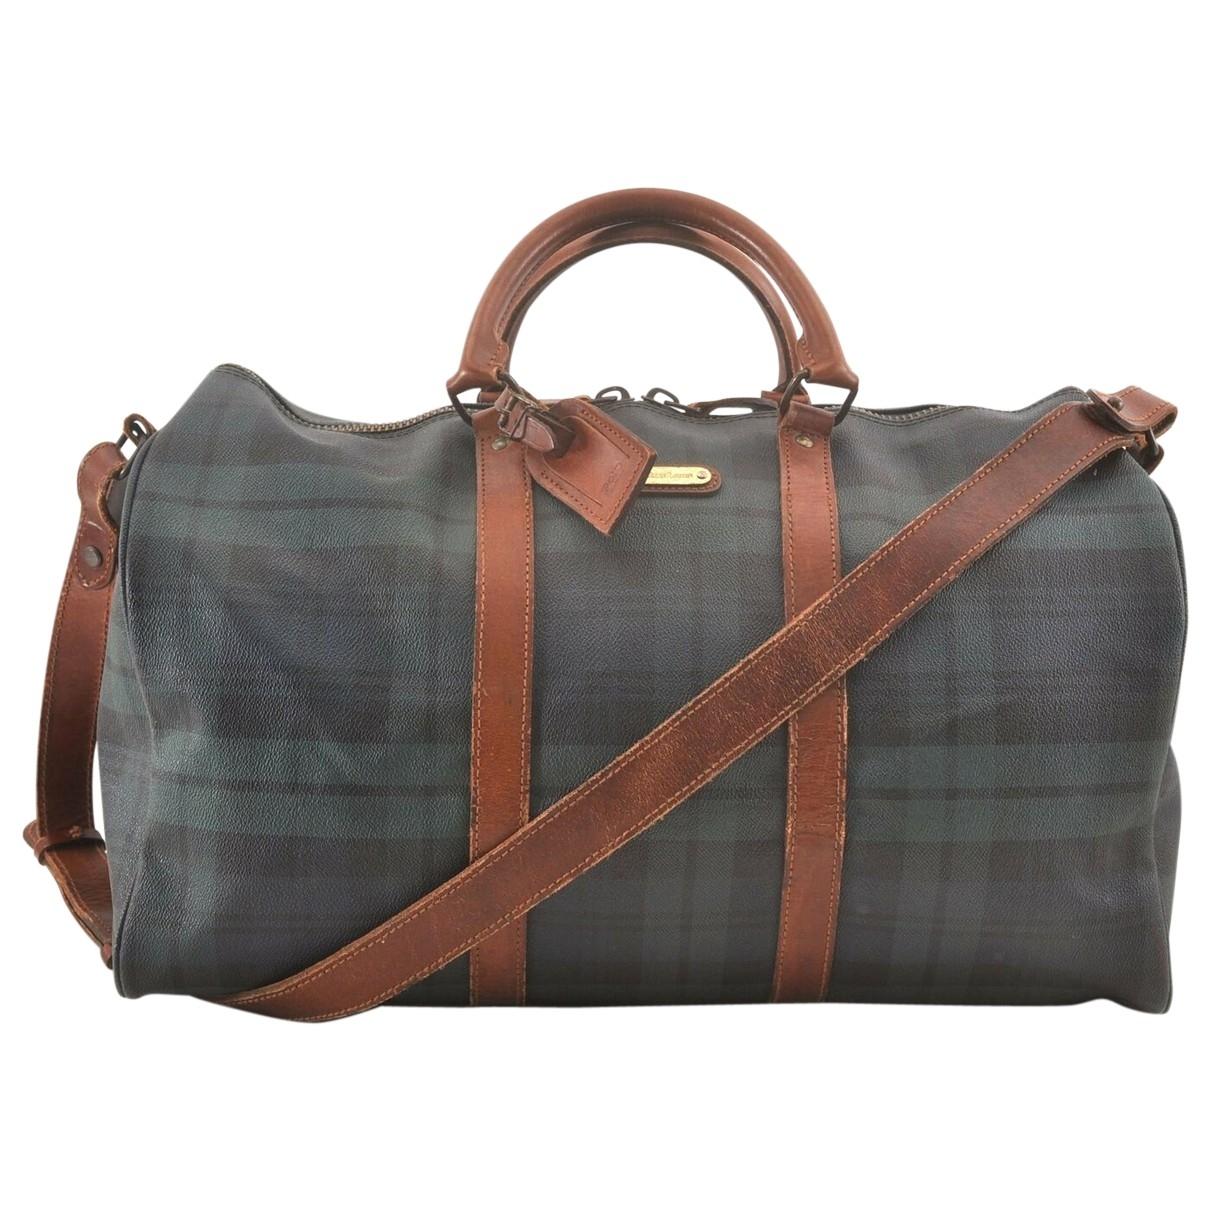 Polo Ralph Lauren \N Green Travel bag for Women \N